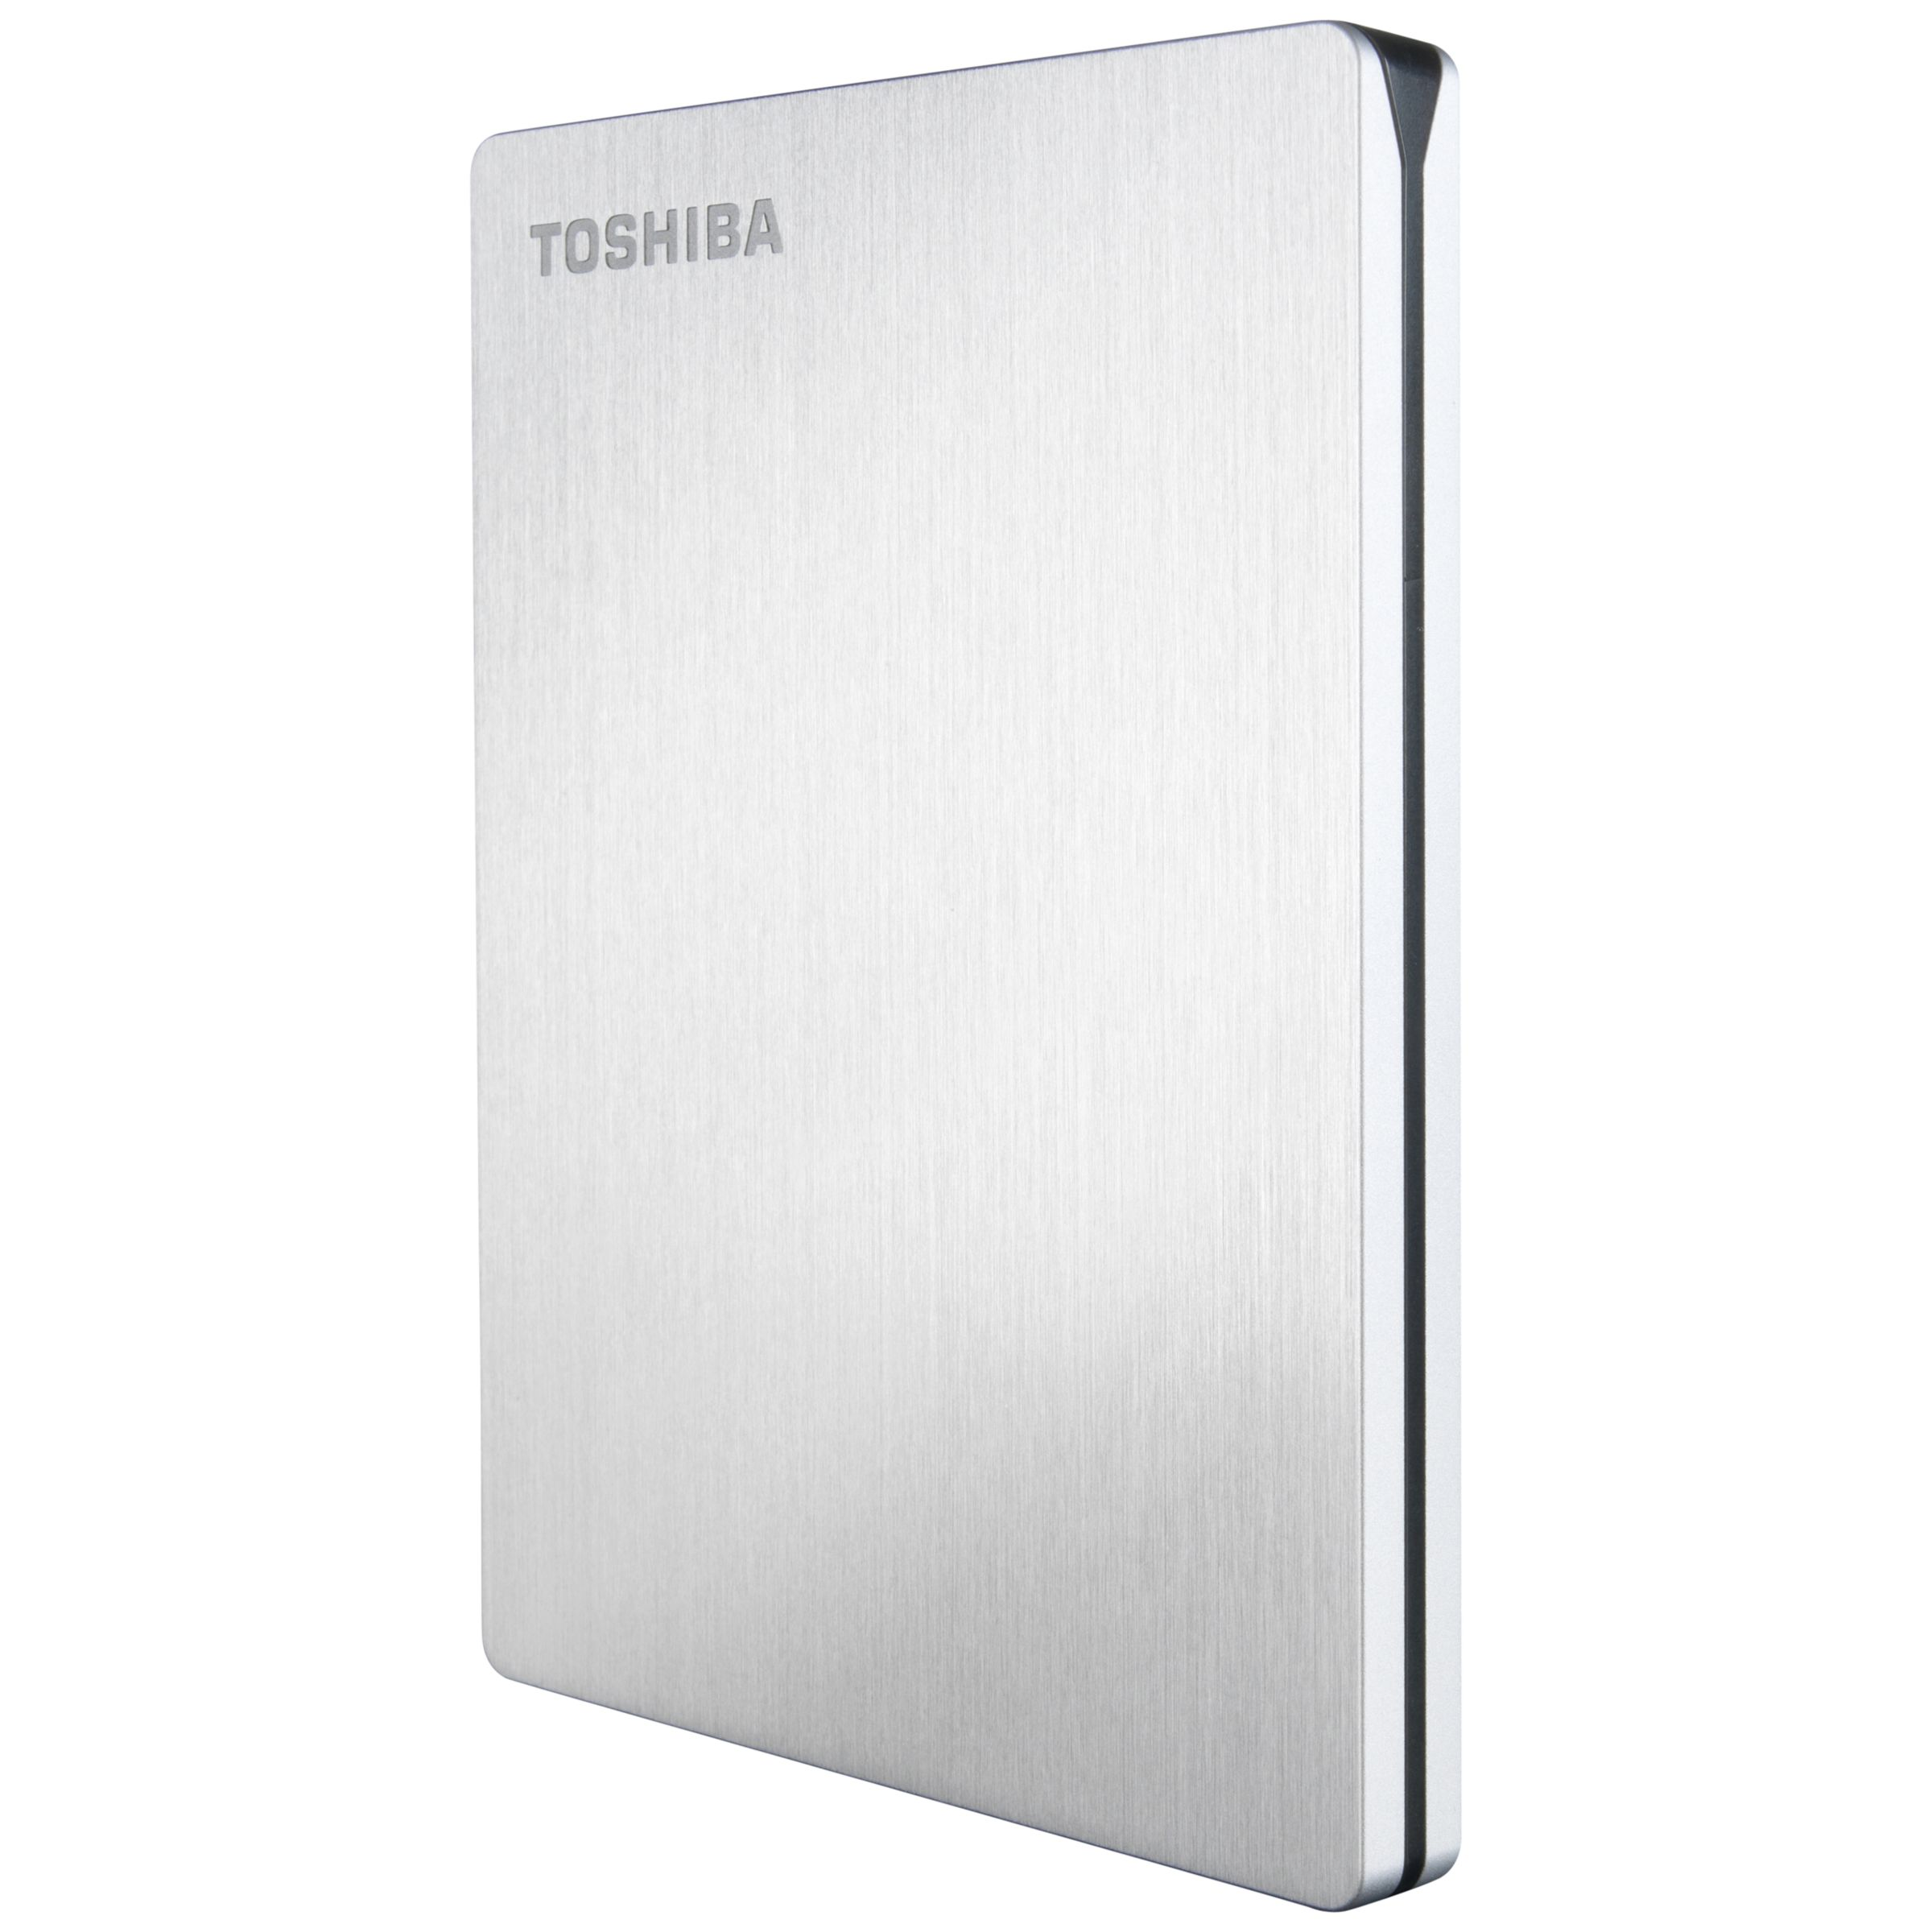 Toshiba Toshiba Canvio Slim for Mac, Portable Hard Drive, USB 3.0, 1TB, Silver